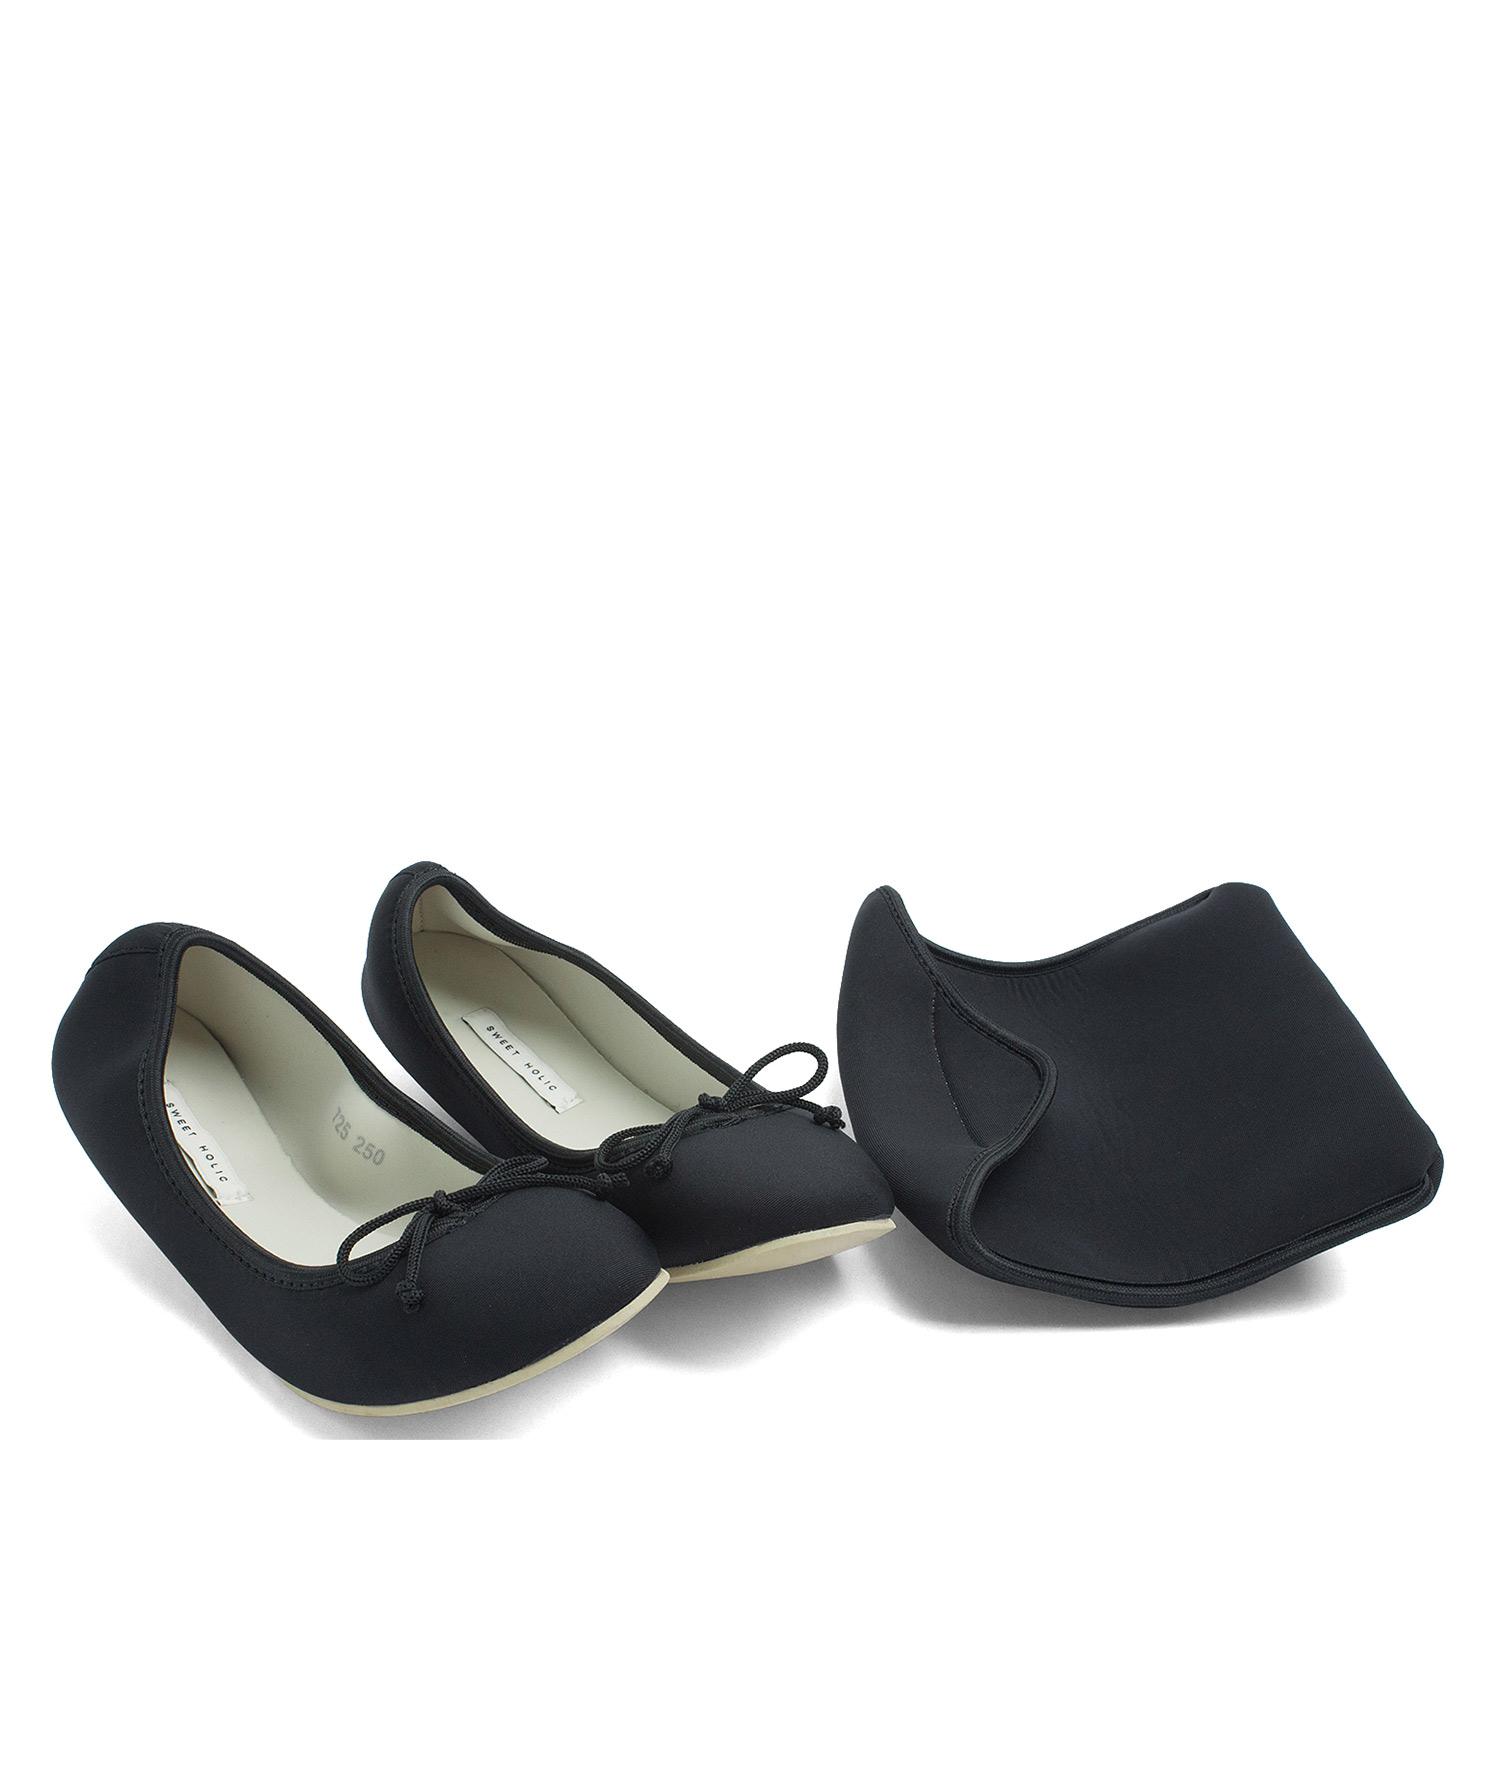 Neoprene Foldable Ballet Flats Cool Colors